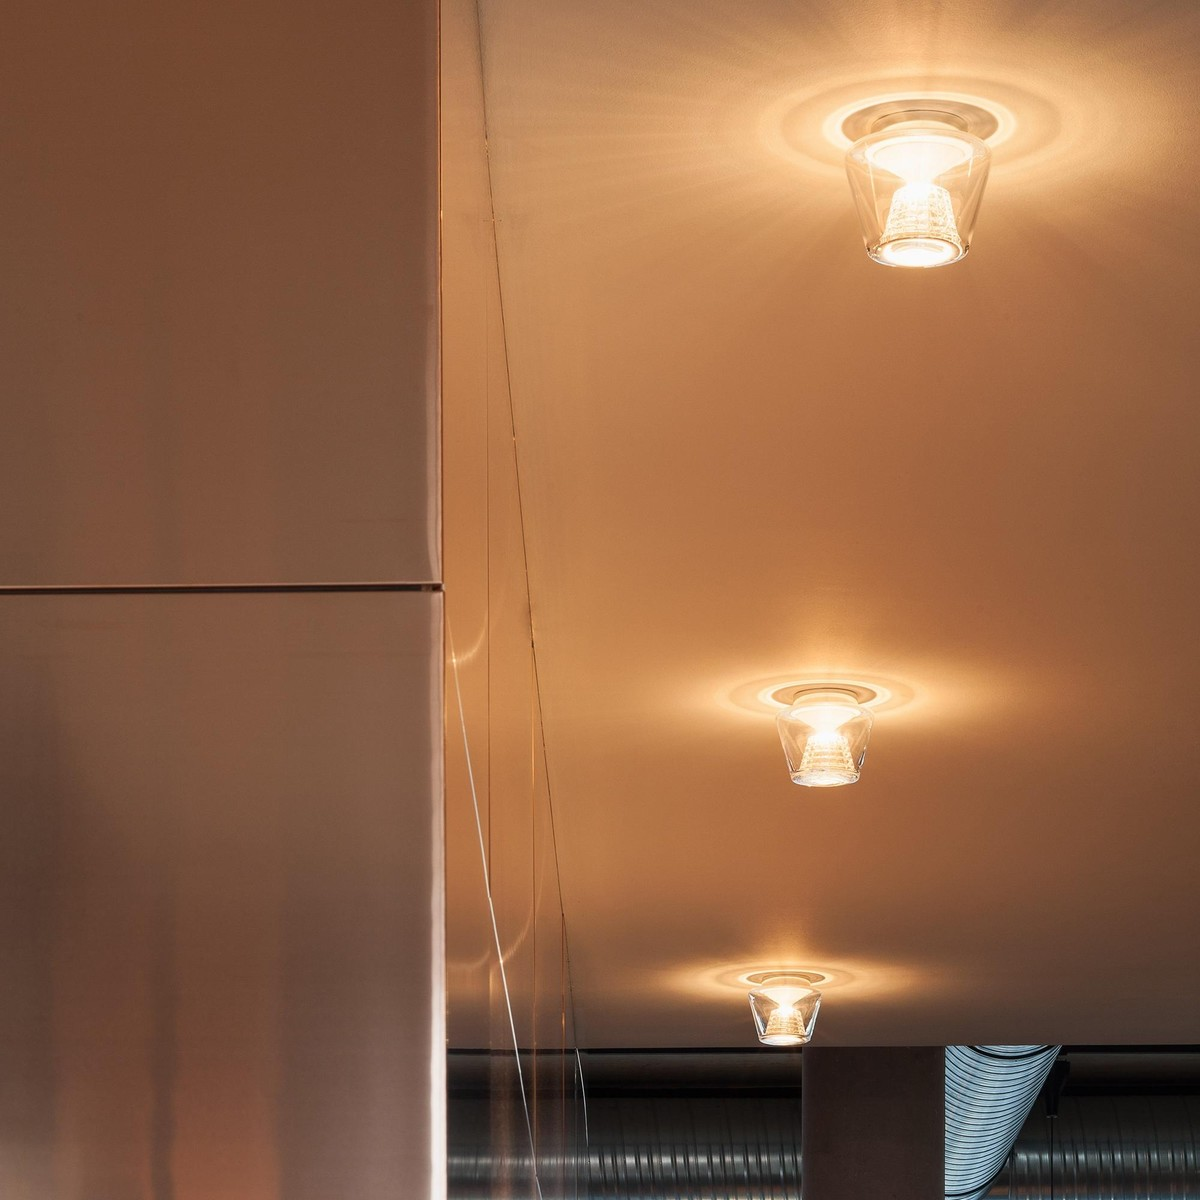 annex ceiling lamp serien. Black Bedroom Furniture Sets. Home Design Ideas